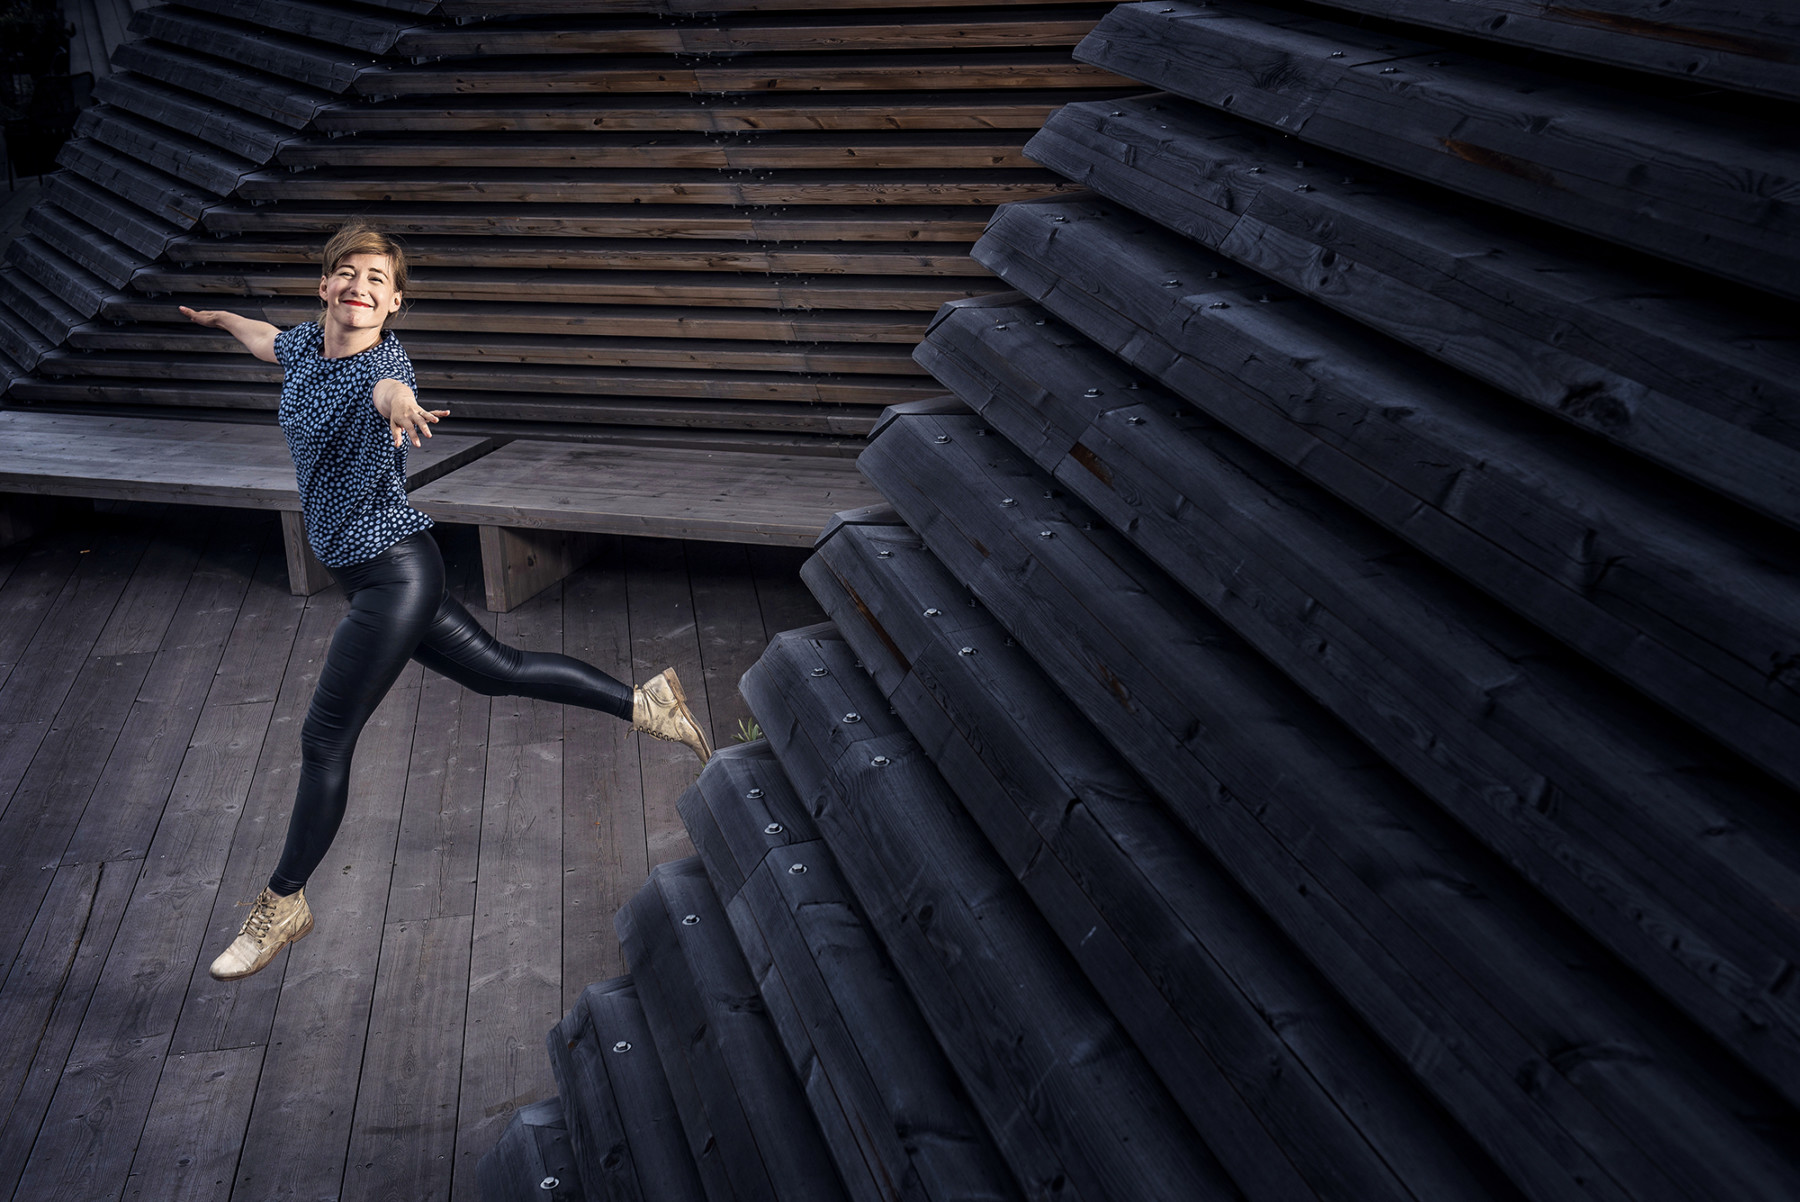 Linda Liukas jumping ballerina-like amidst dark wooden walls and floor.